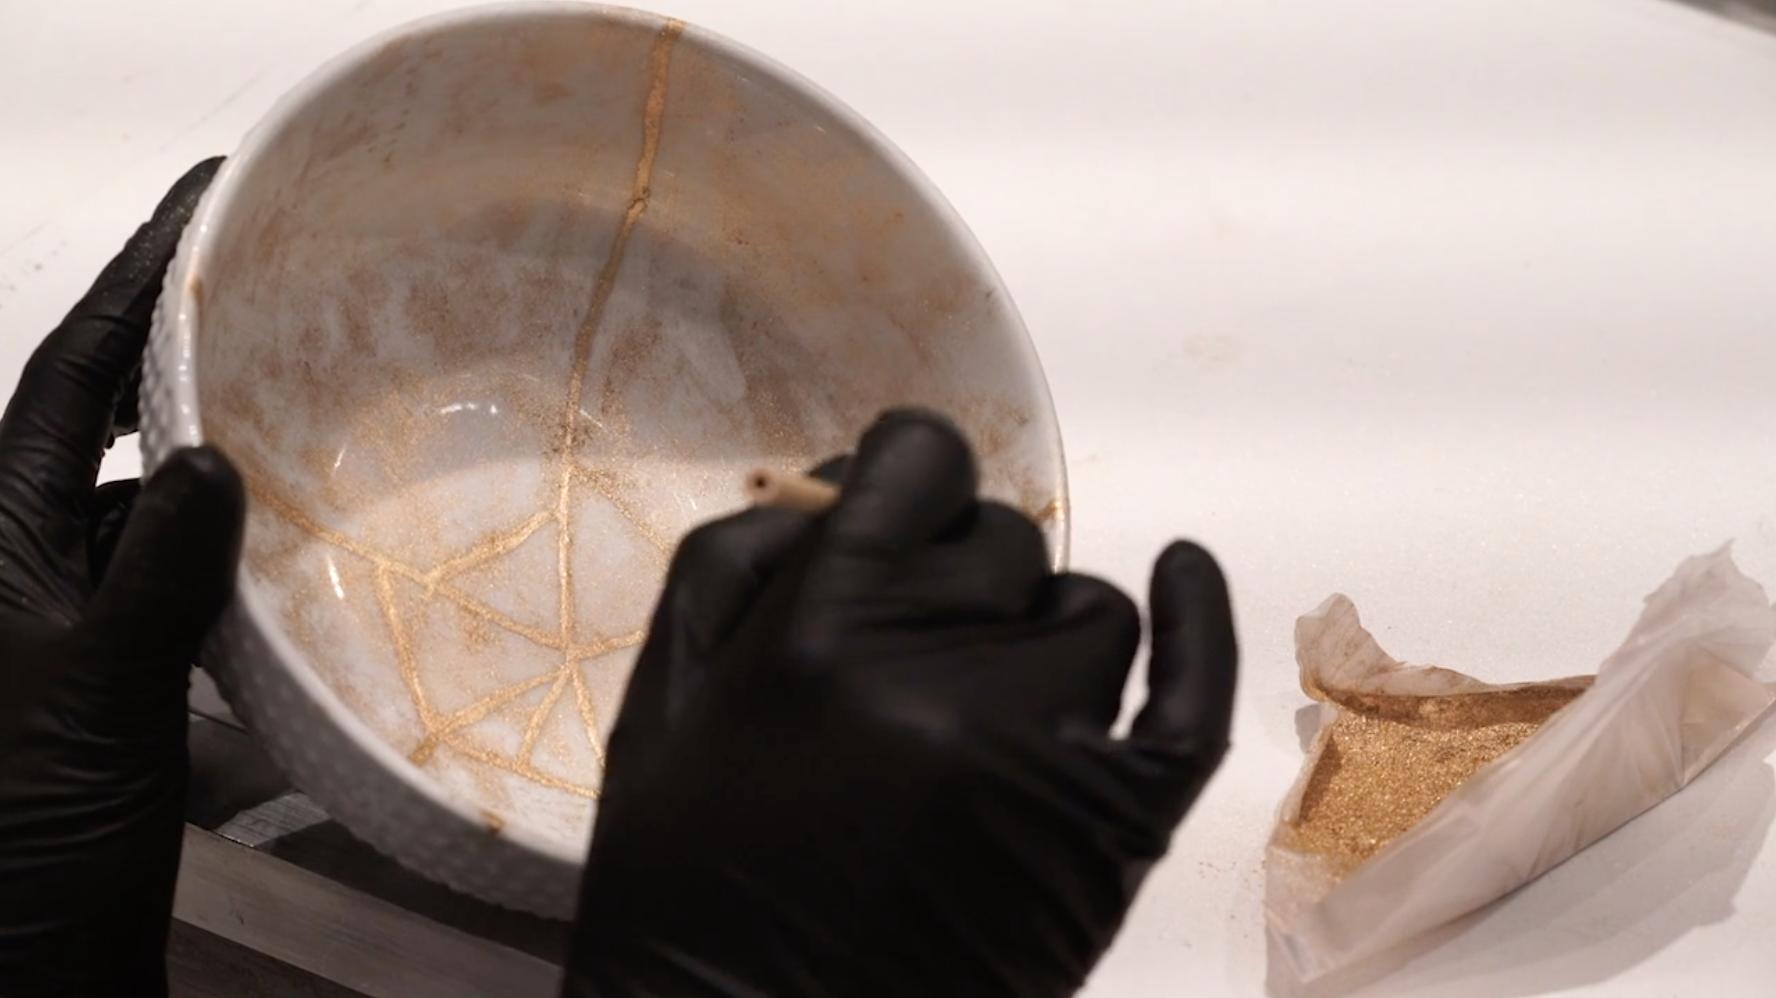 Repairing cracked bowl